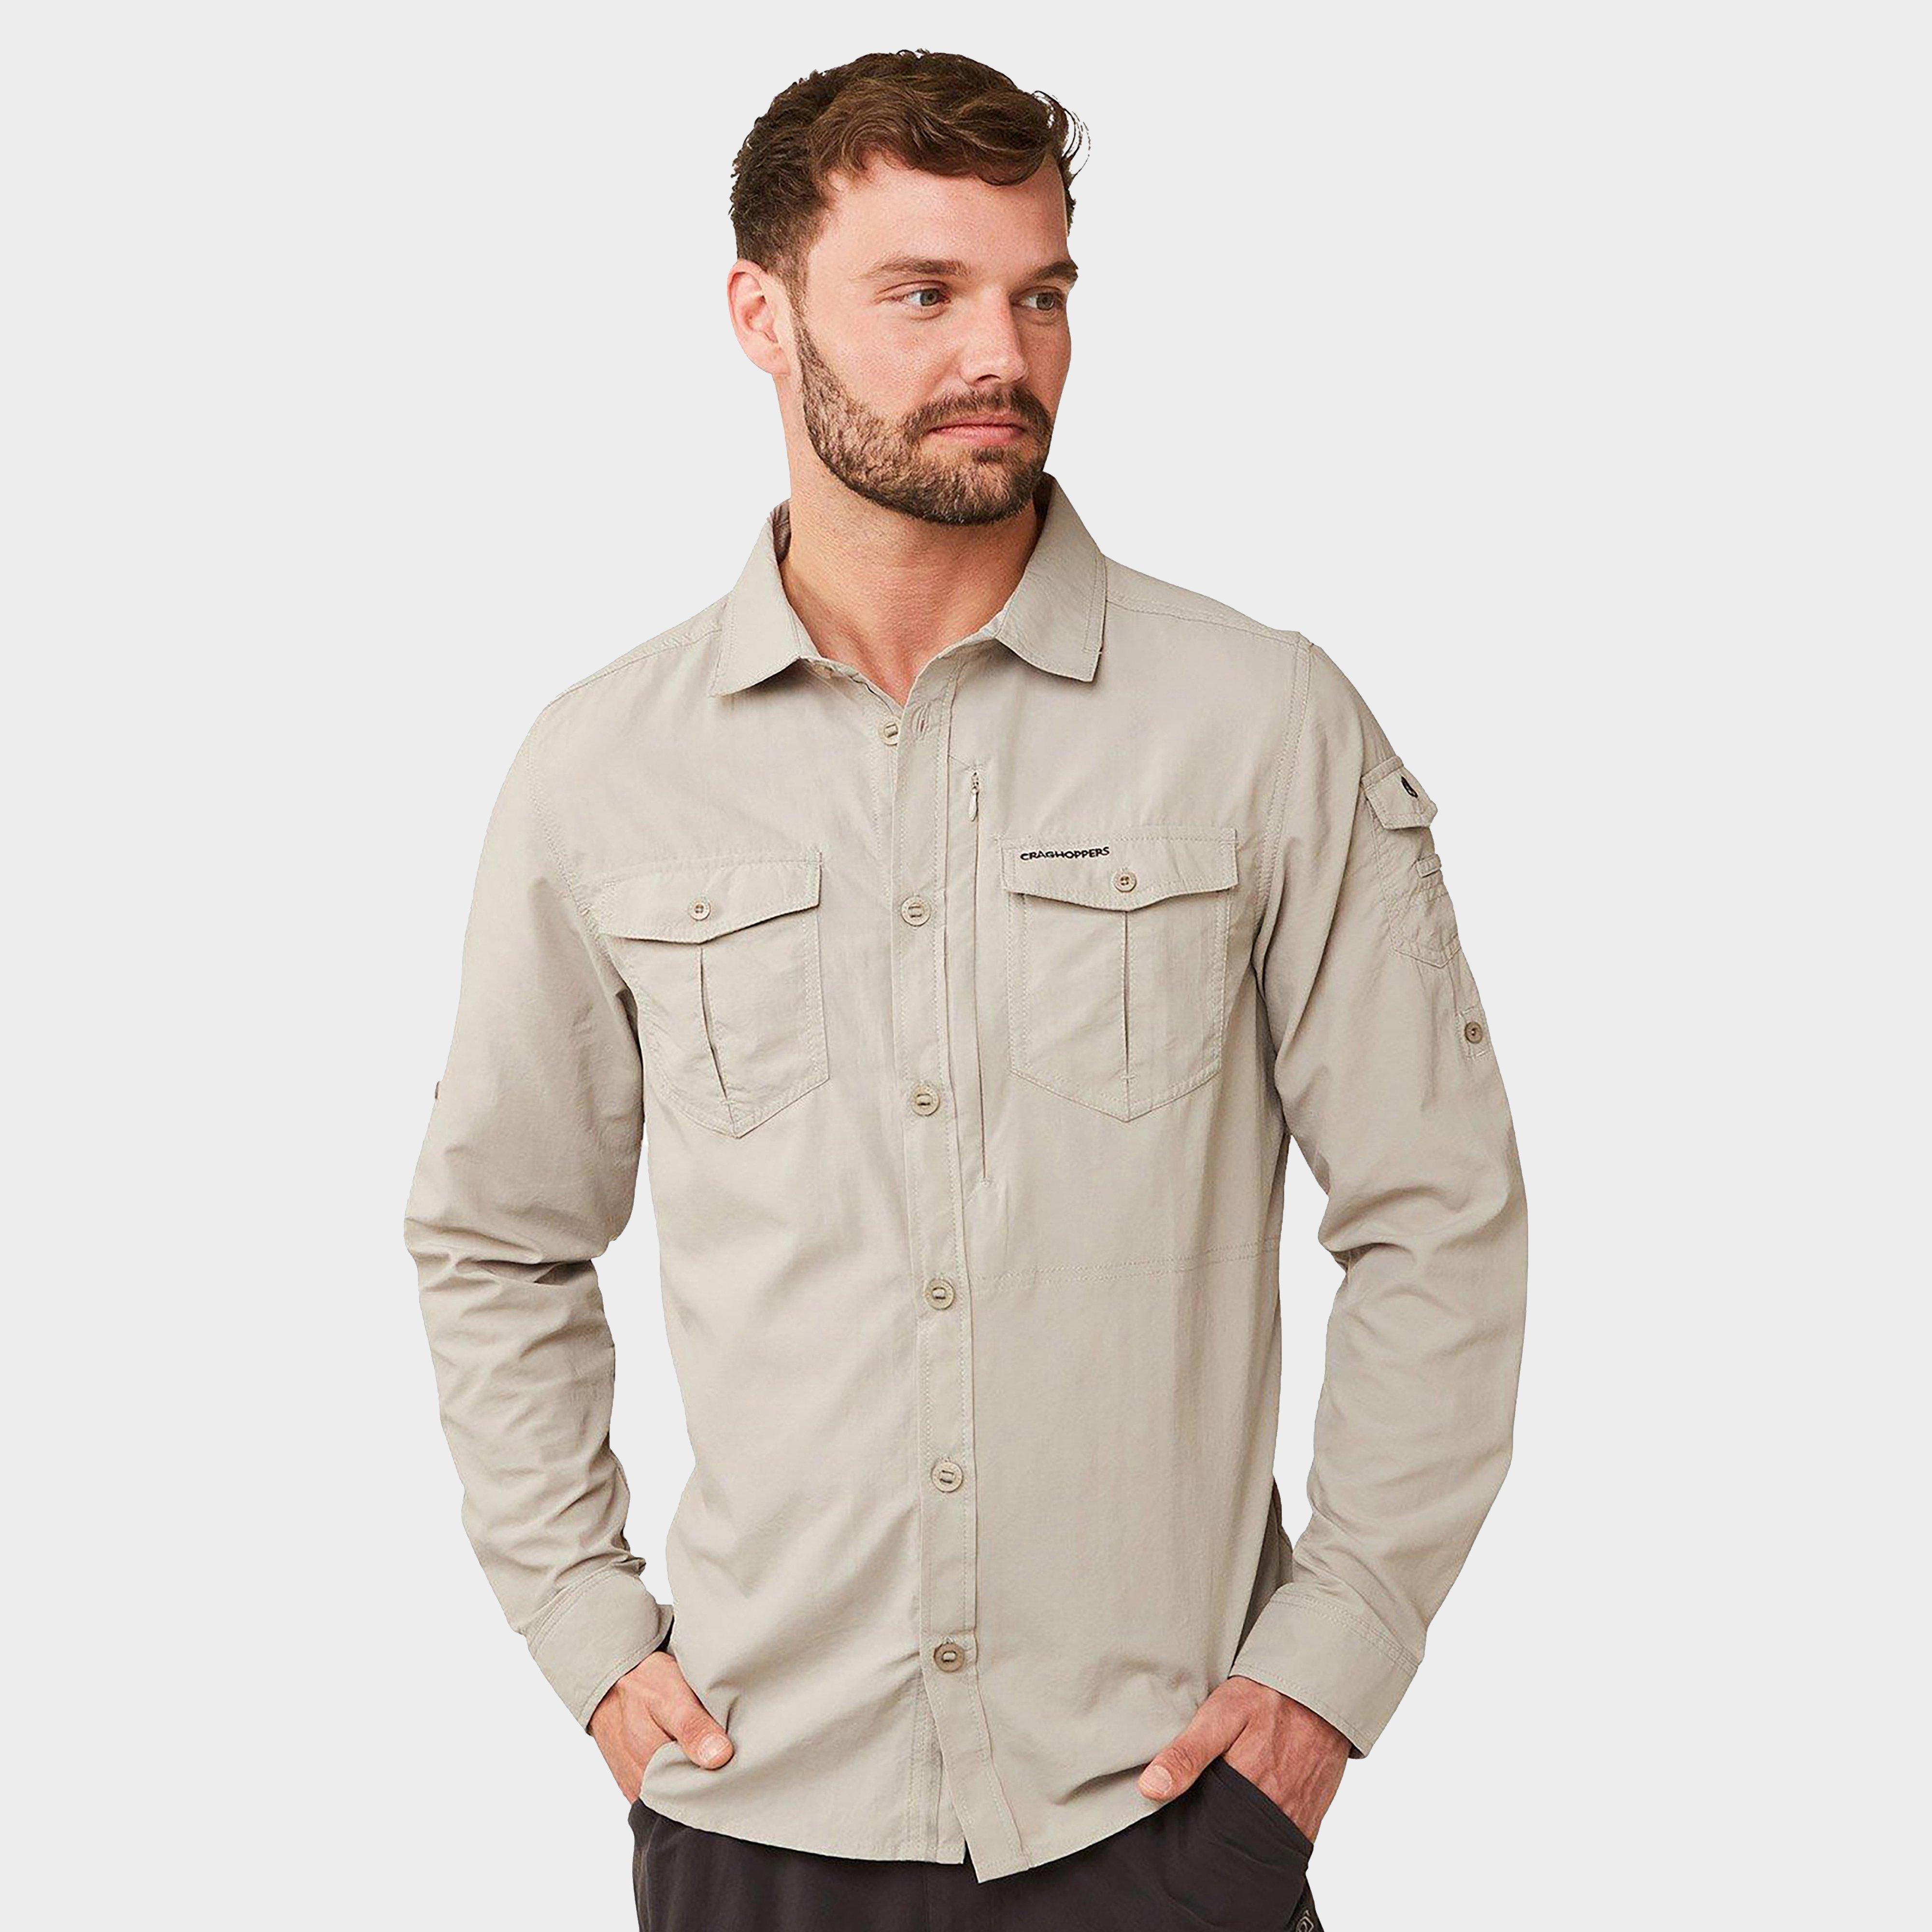 Craghoppers Men's Nosilife Adventure Ii Shirt - Cream/Stn, Cream